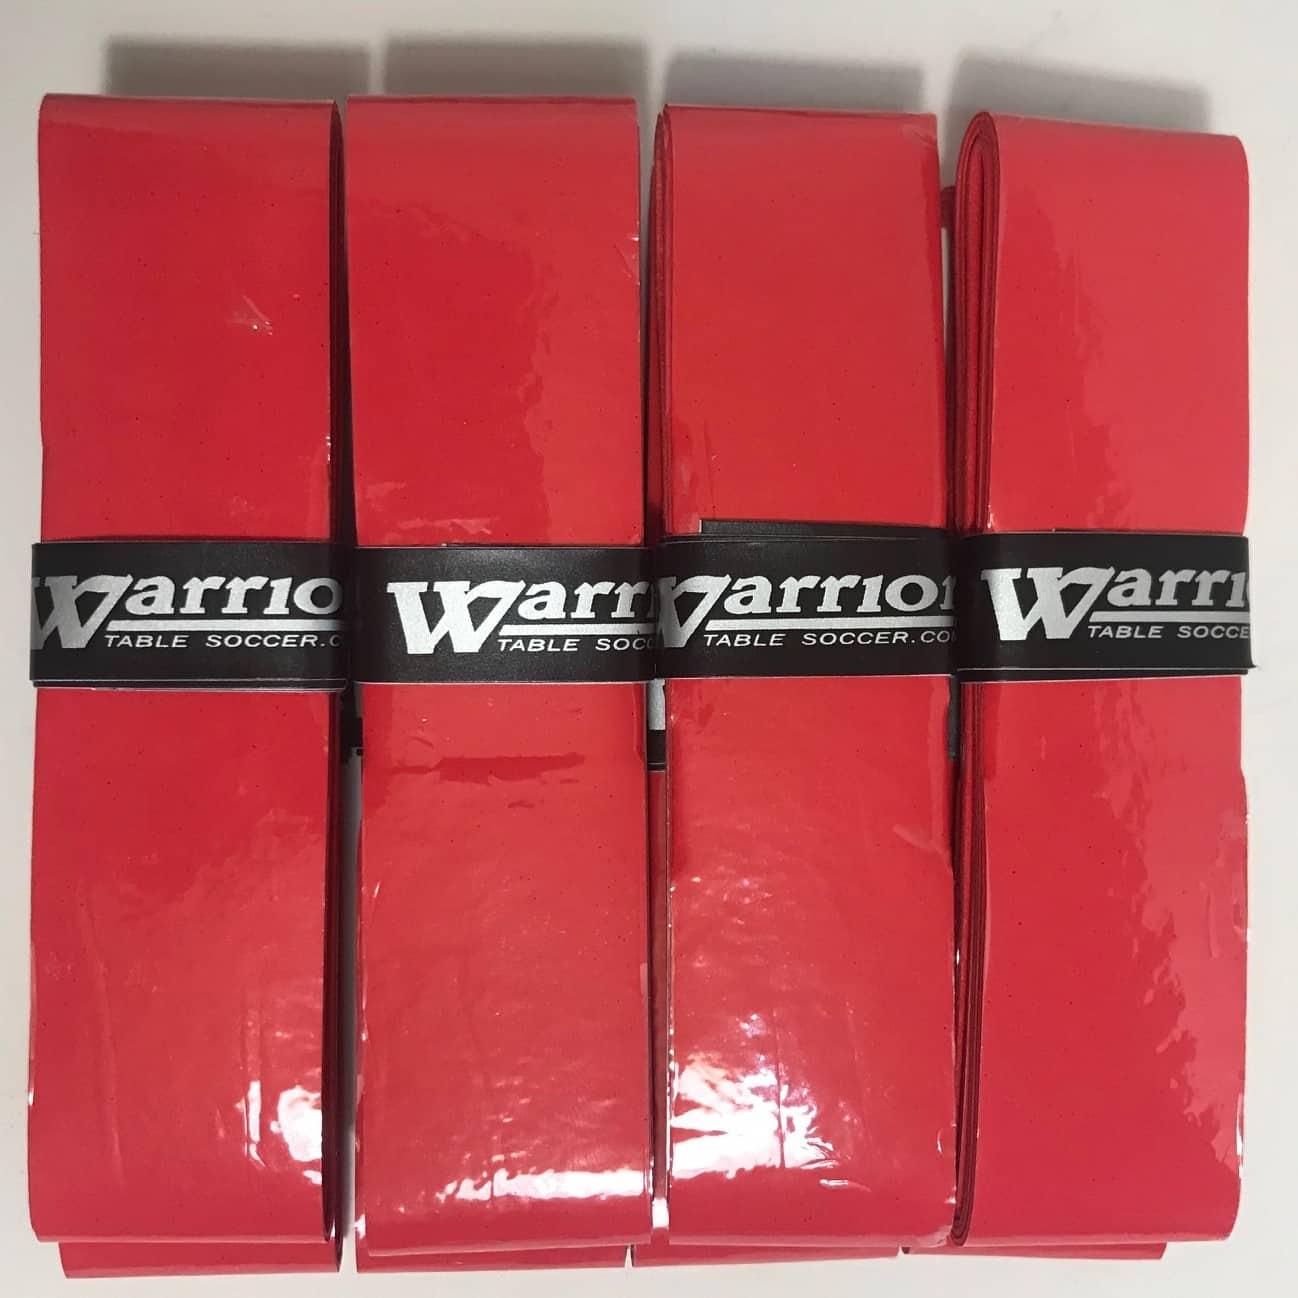 2 Yellow and 2 Orange Pro Foosball Table Handle Wraps Bravatto Foosball Wraps 4-Pack